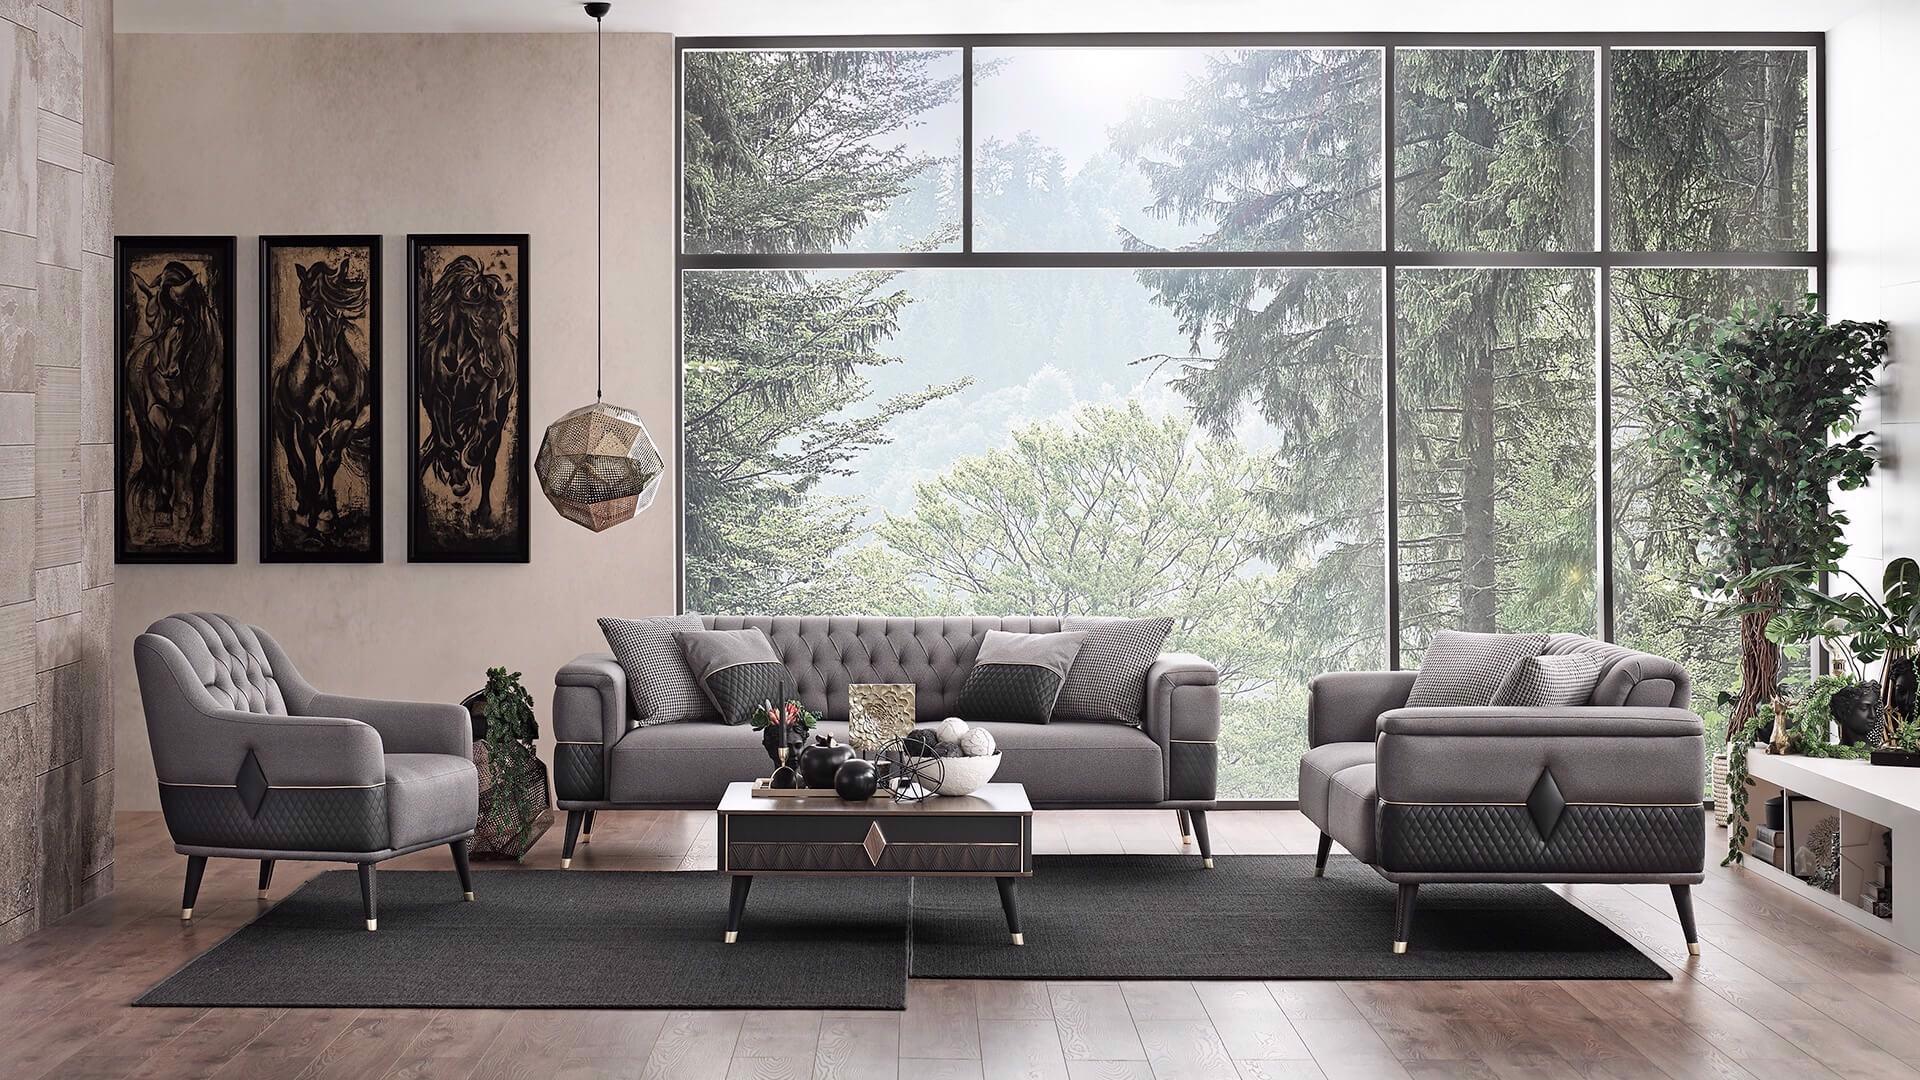 Canapea tapitata cu stofa si piele ecologica, 2 locuri, cu functie sleep pentru 1 persoana Diamond Gri inchis / Negru, l192xA92xH78 cm